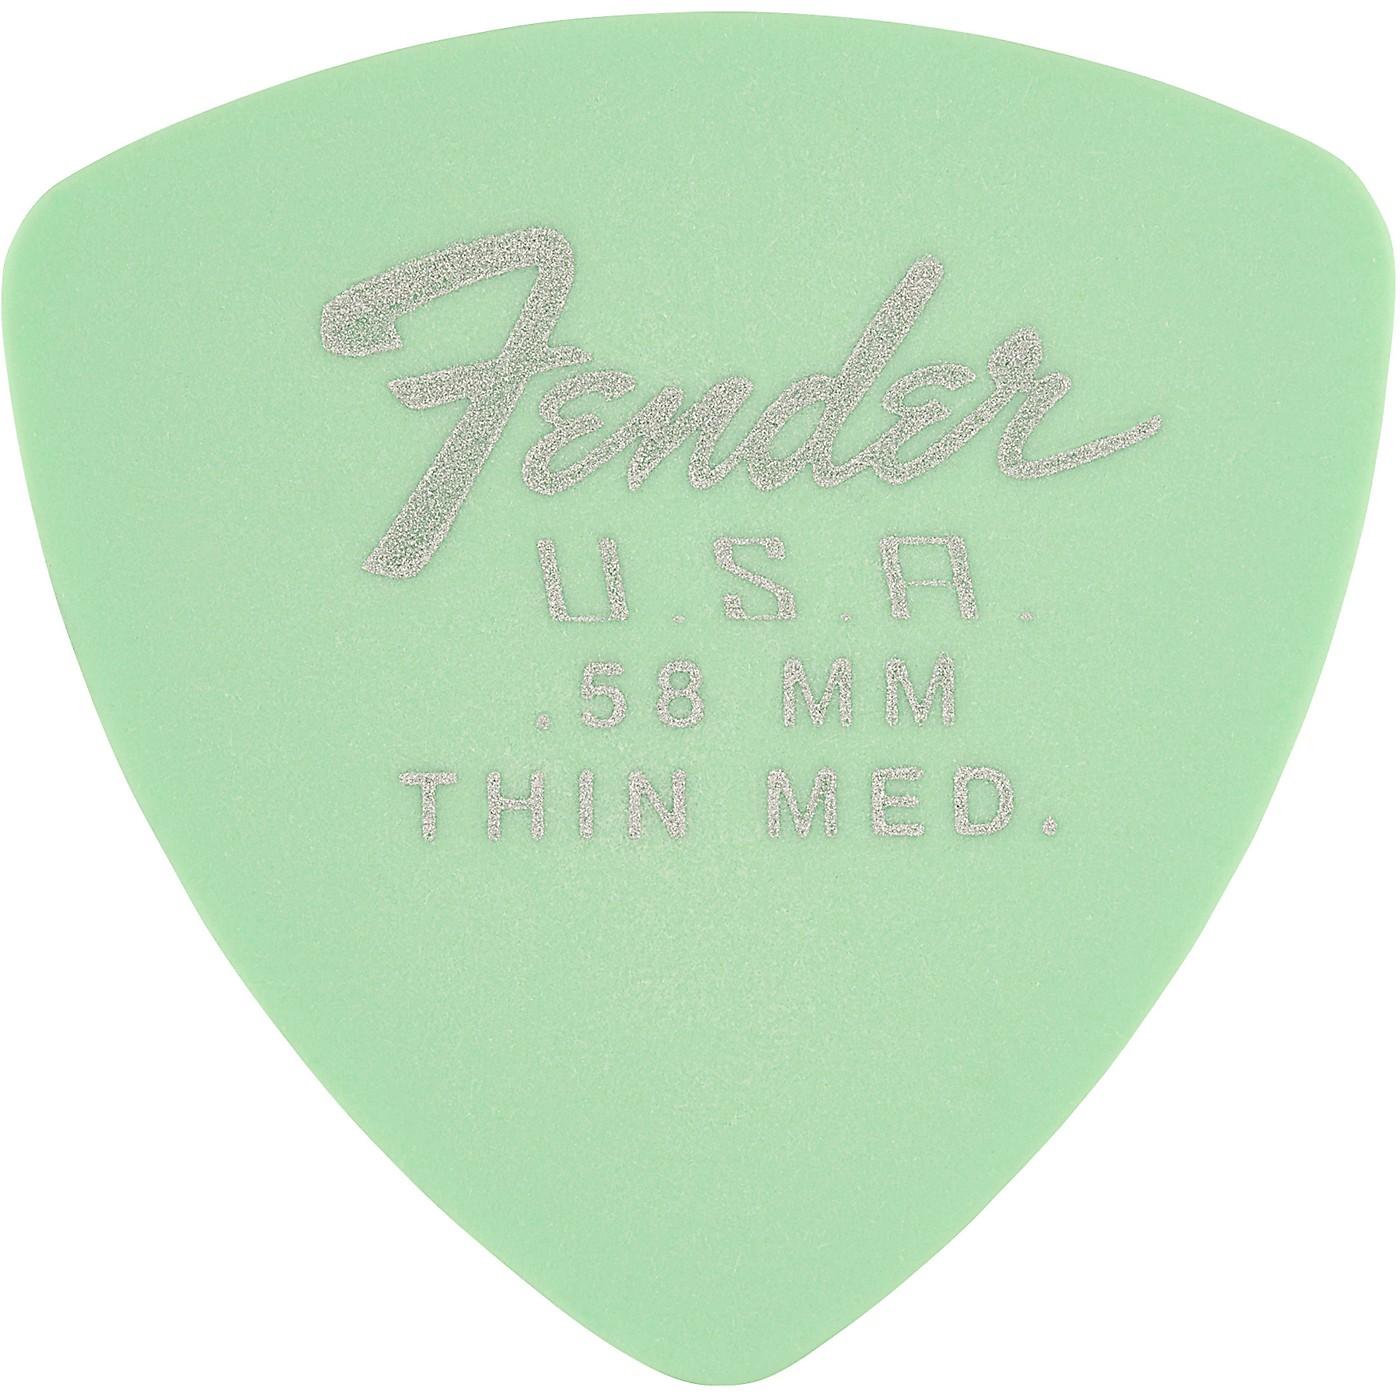 Fender 346 Dura-Tone Delrin Pick (12-Pack), Surf Green thumbnail